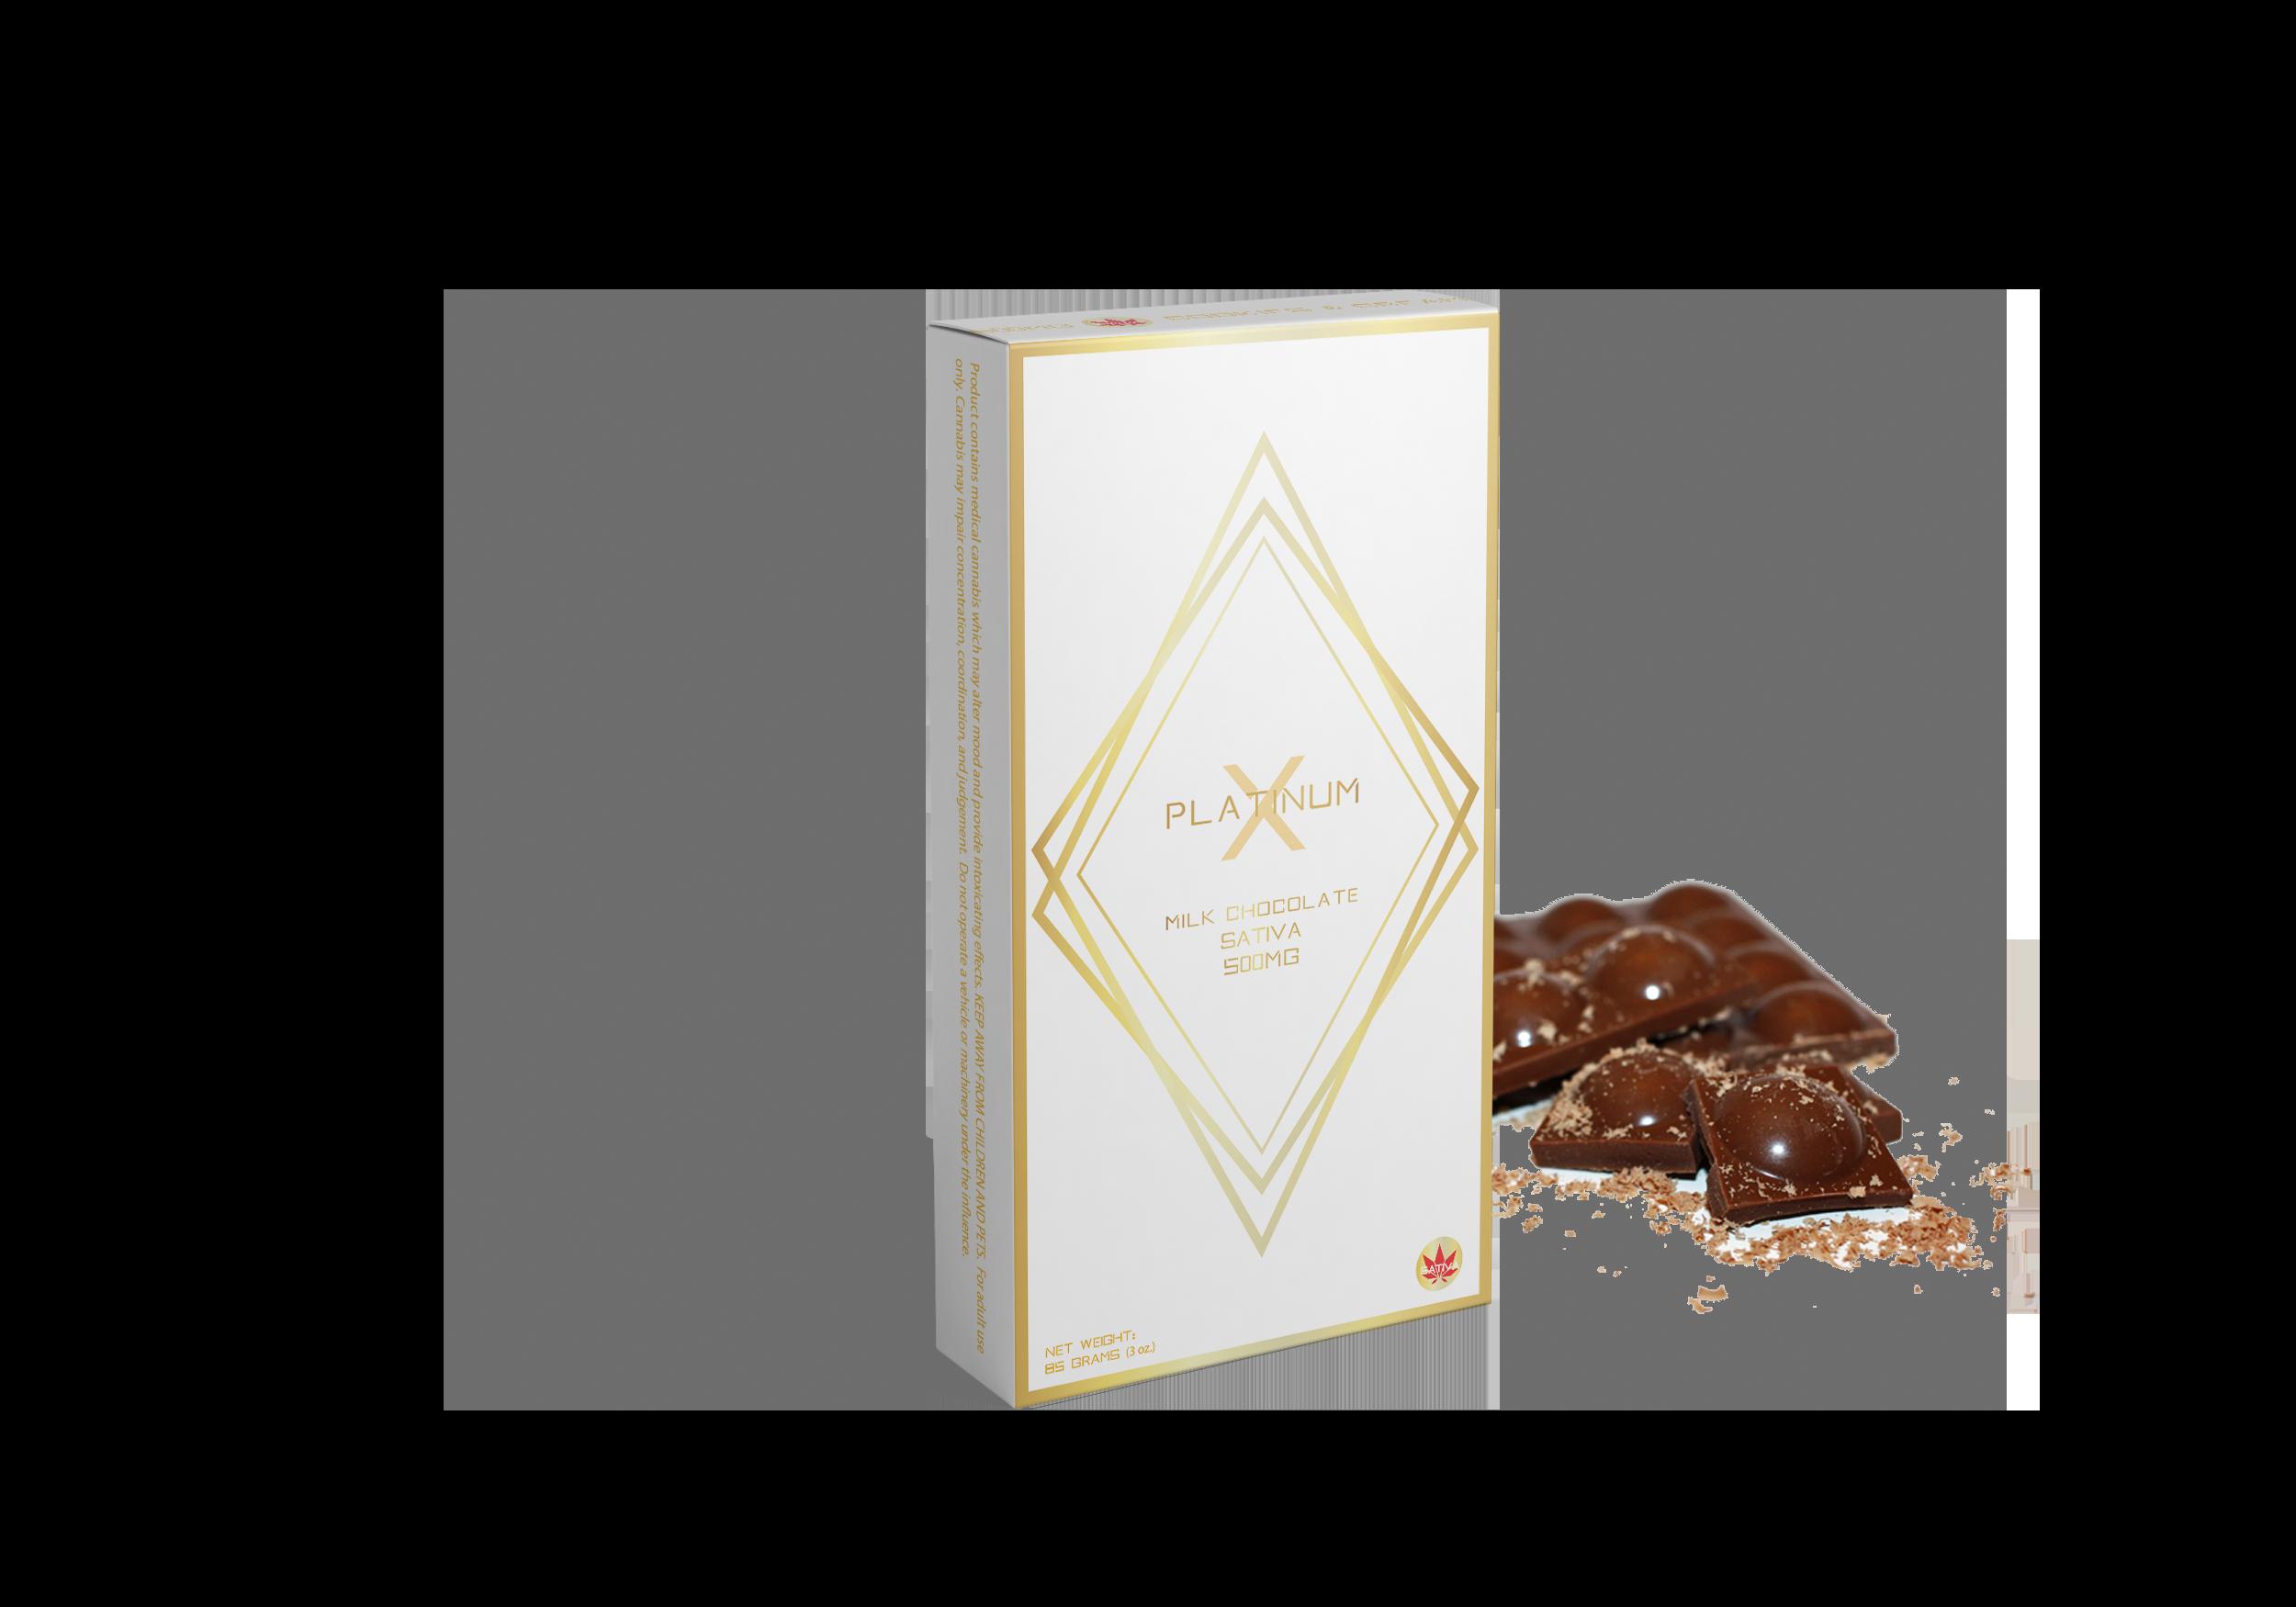 MILK CHOCOLATE 500MG SATIVA - PlatinumX